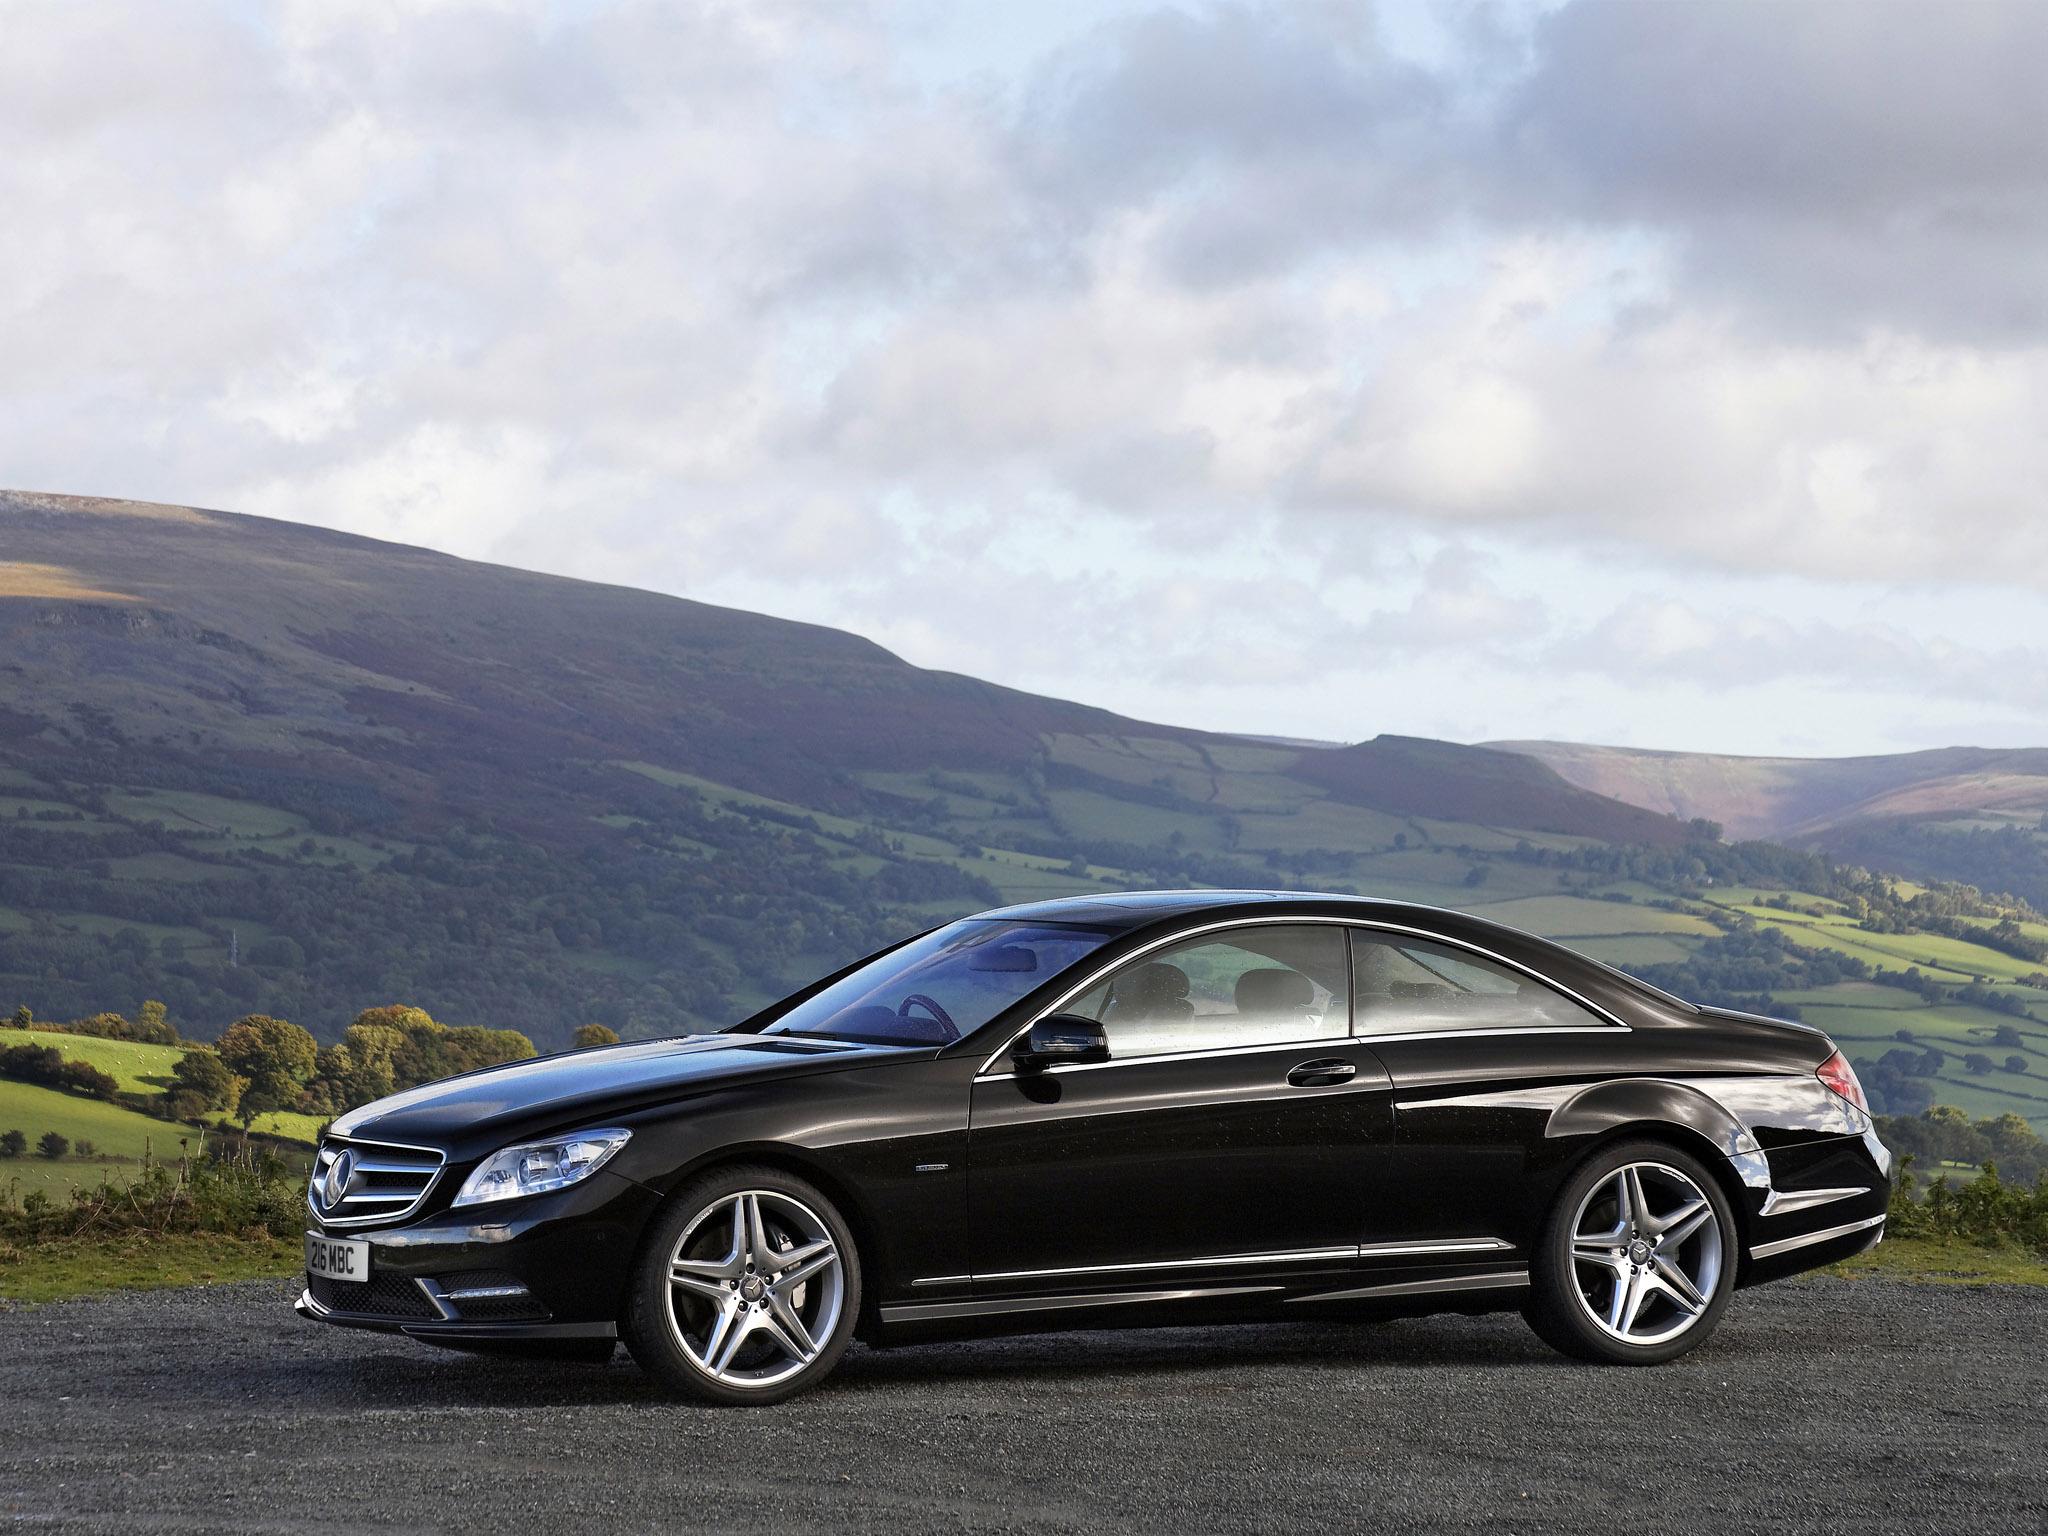 Mercedes benz cl500 amg photos reviews news specs buy car for Mercedes benz cl500 review